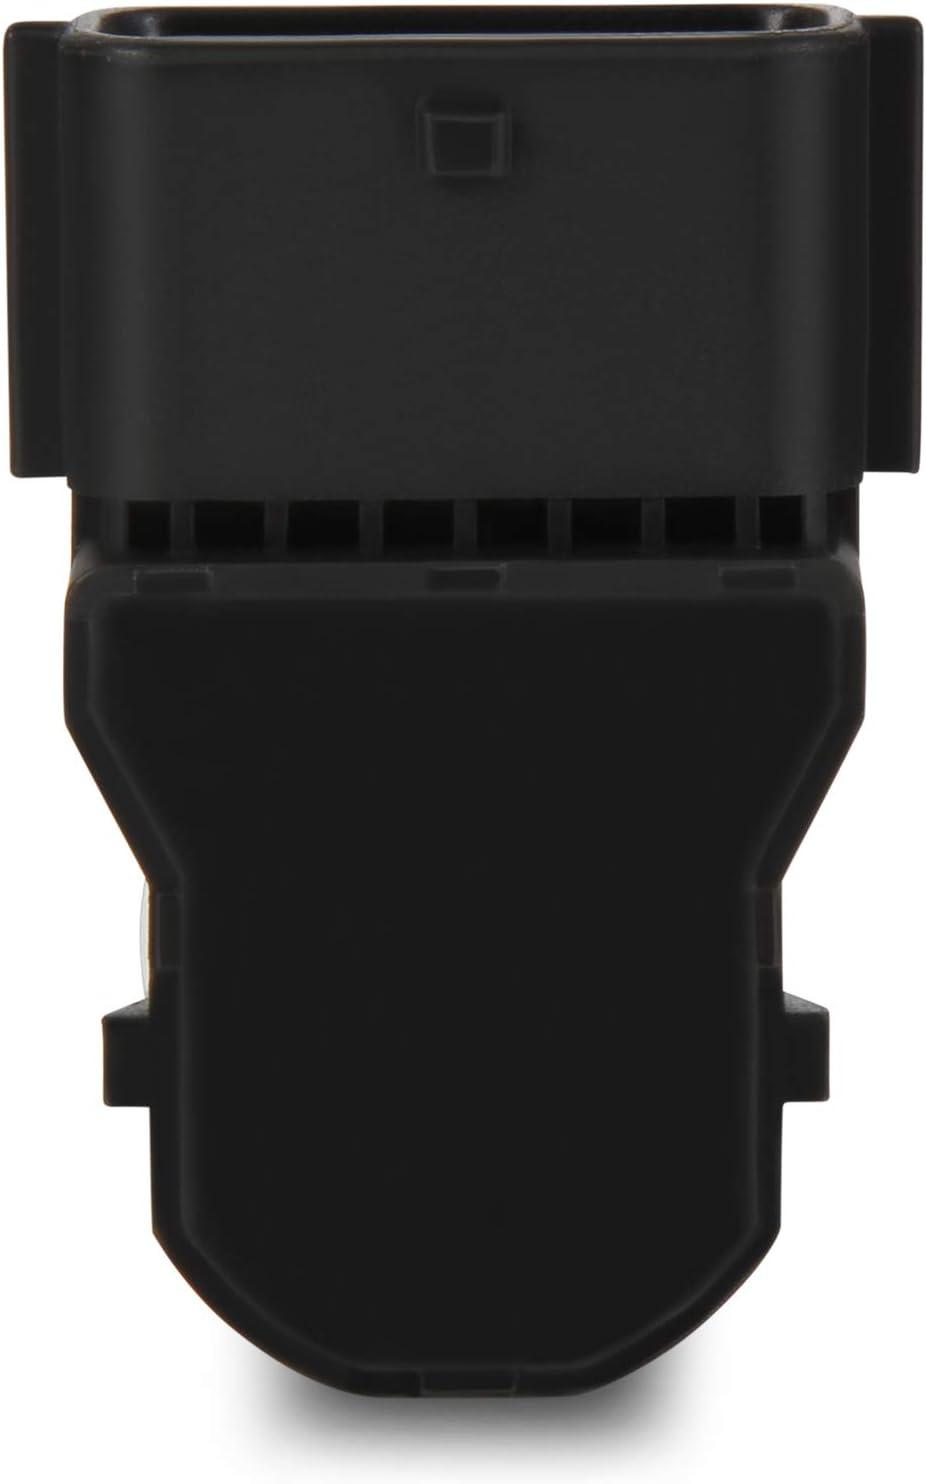 Madlife Garage 957203z000 Pdc Sensor Parksensor Elektronik